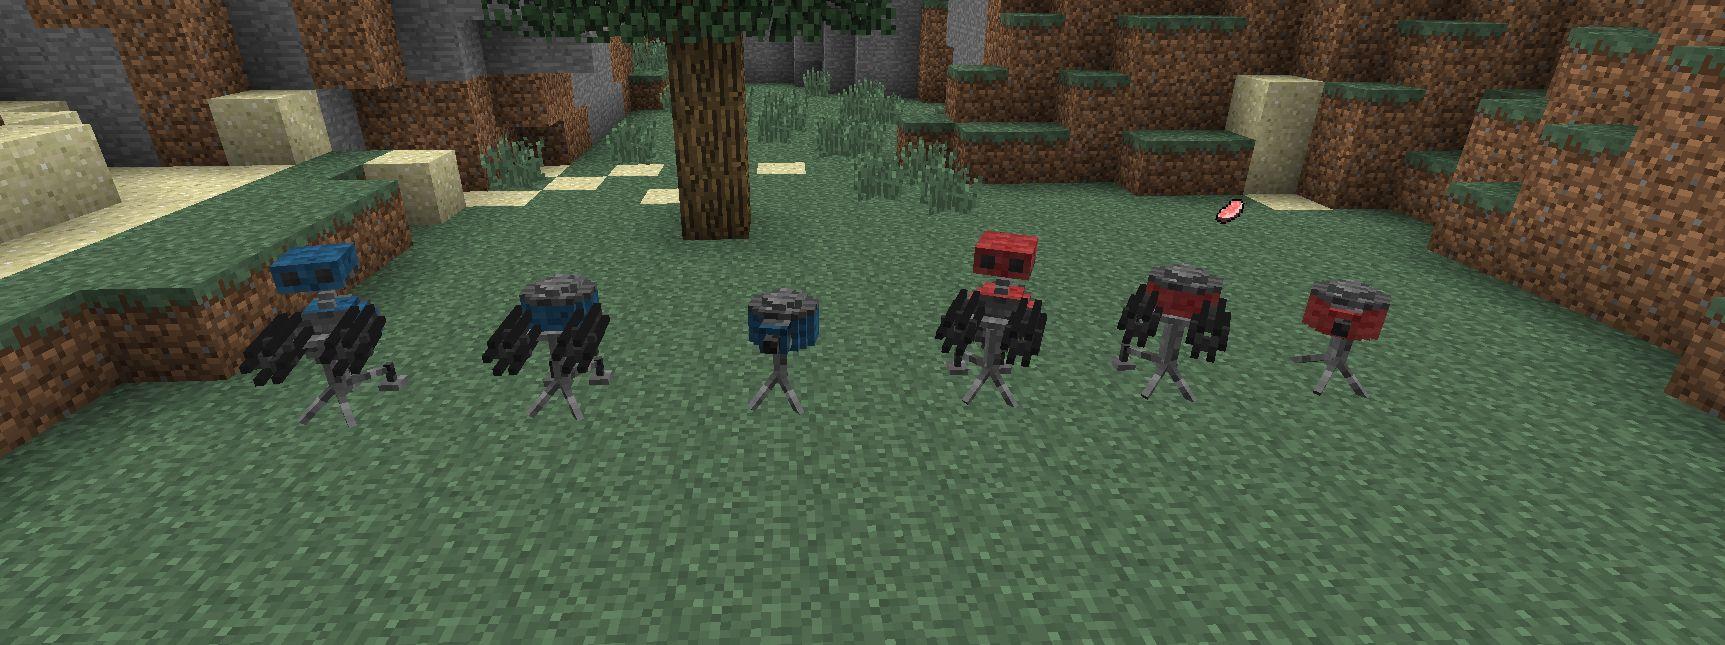 -Team Fortress 2-mod-armas-3